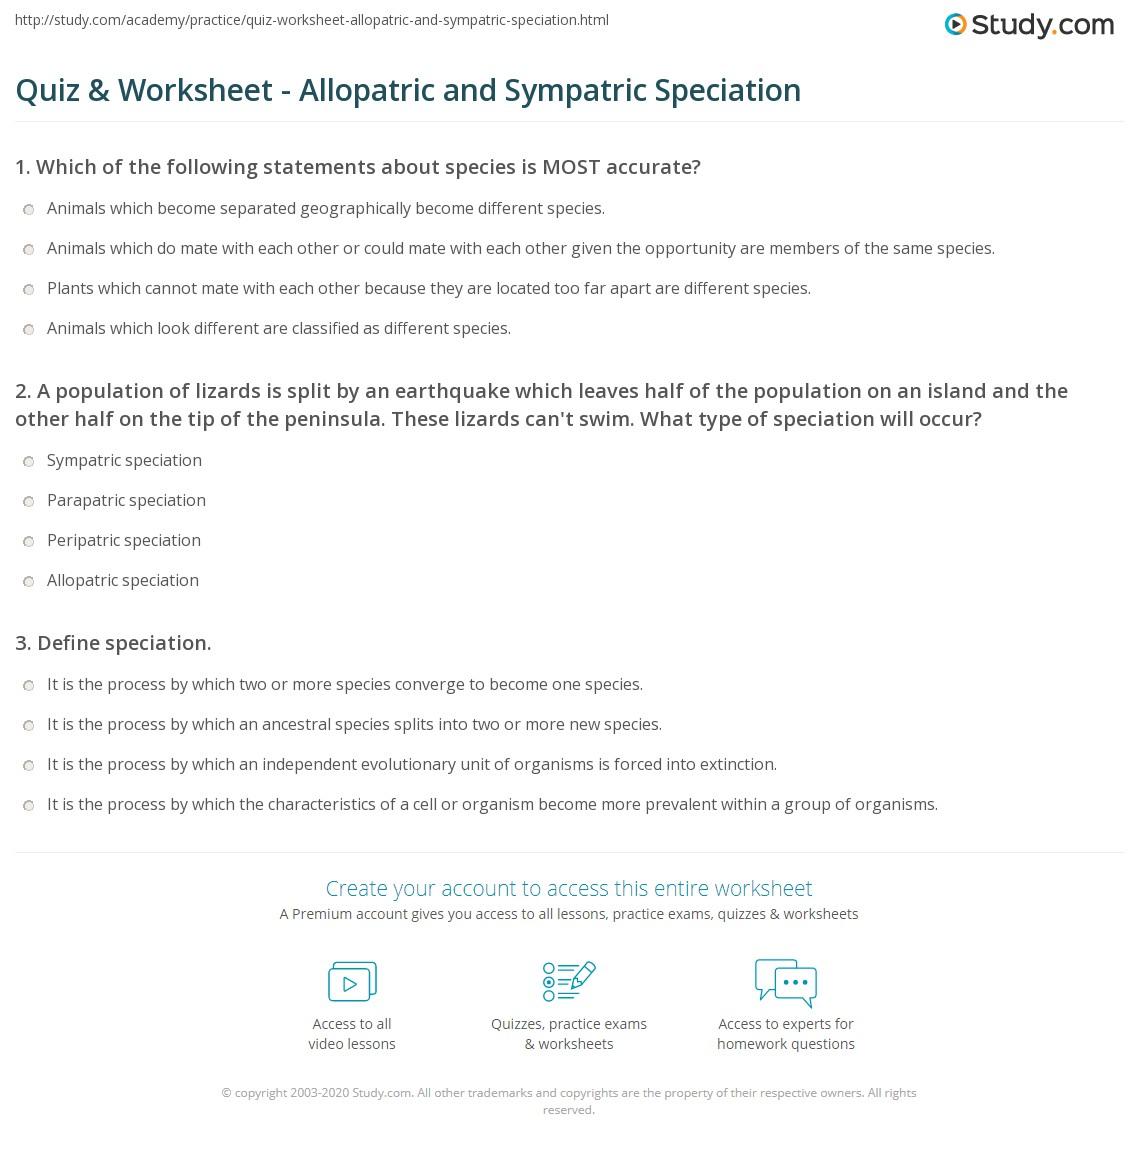 Pictures Speciation Worksheet